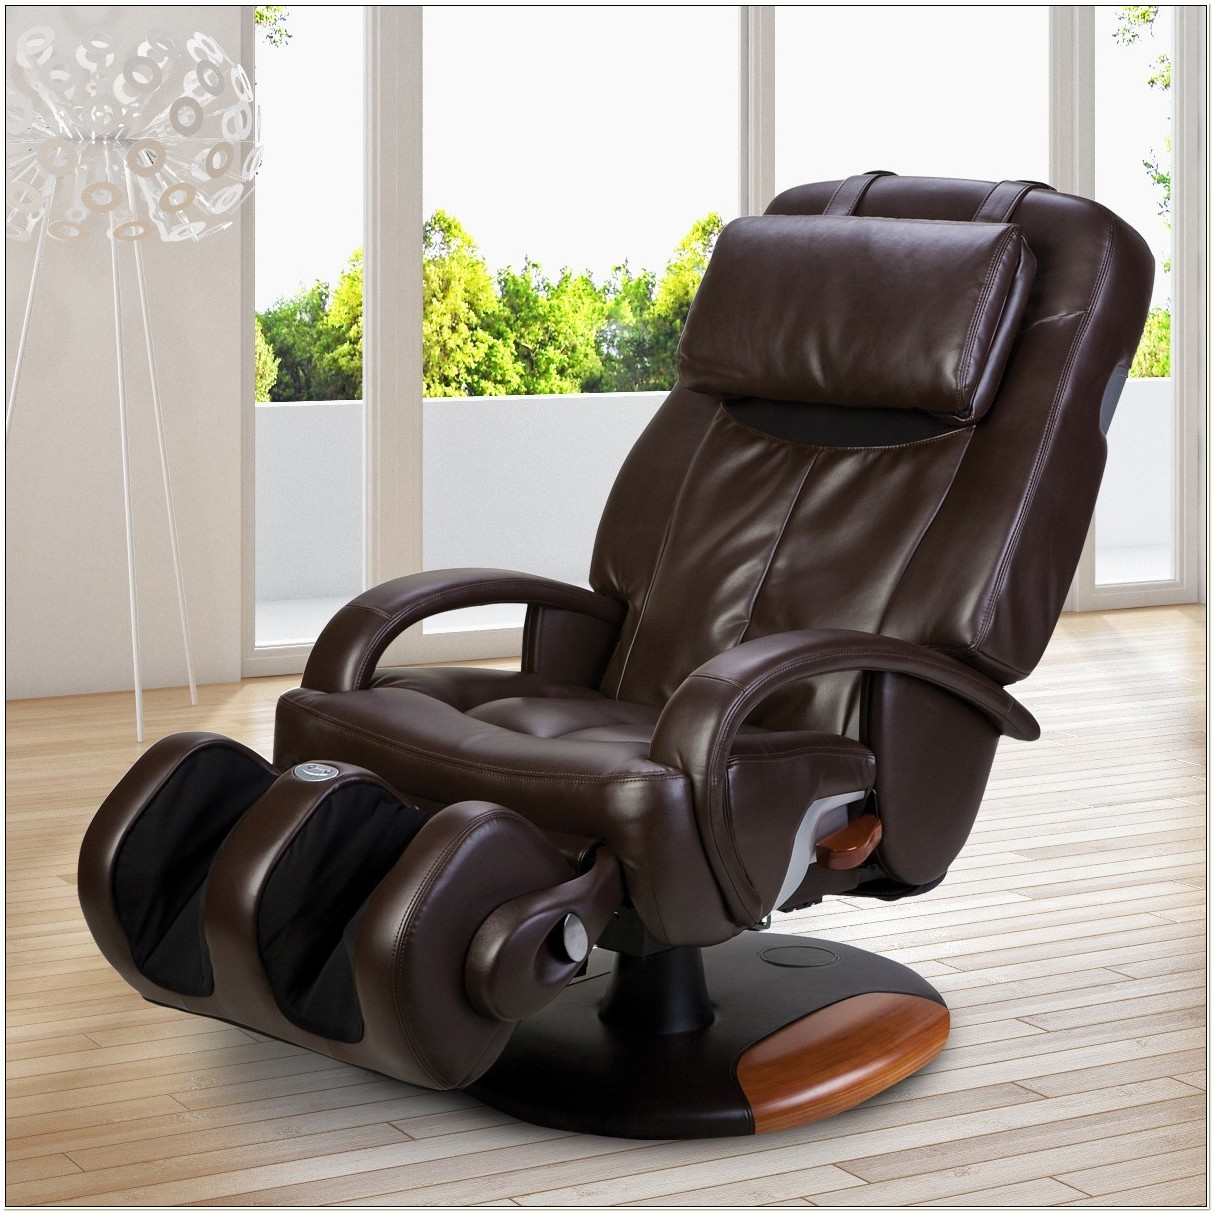 Sharper Image Massage Chair Human Touch